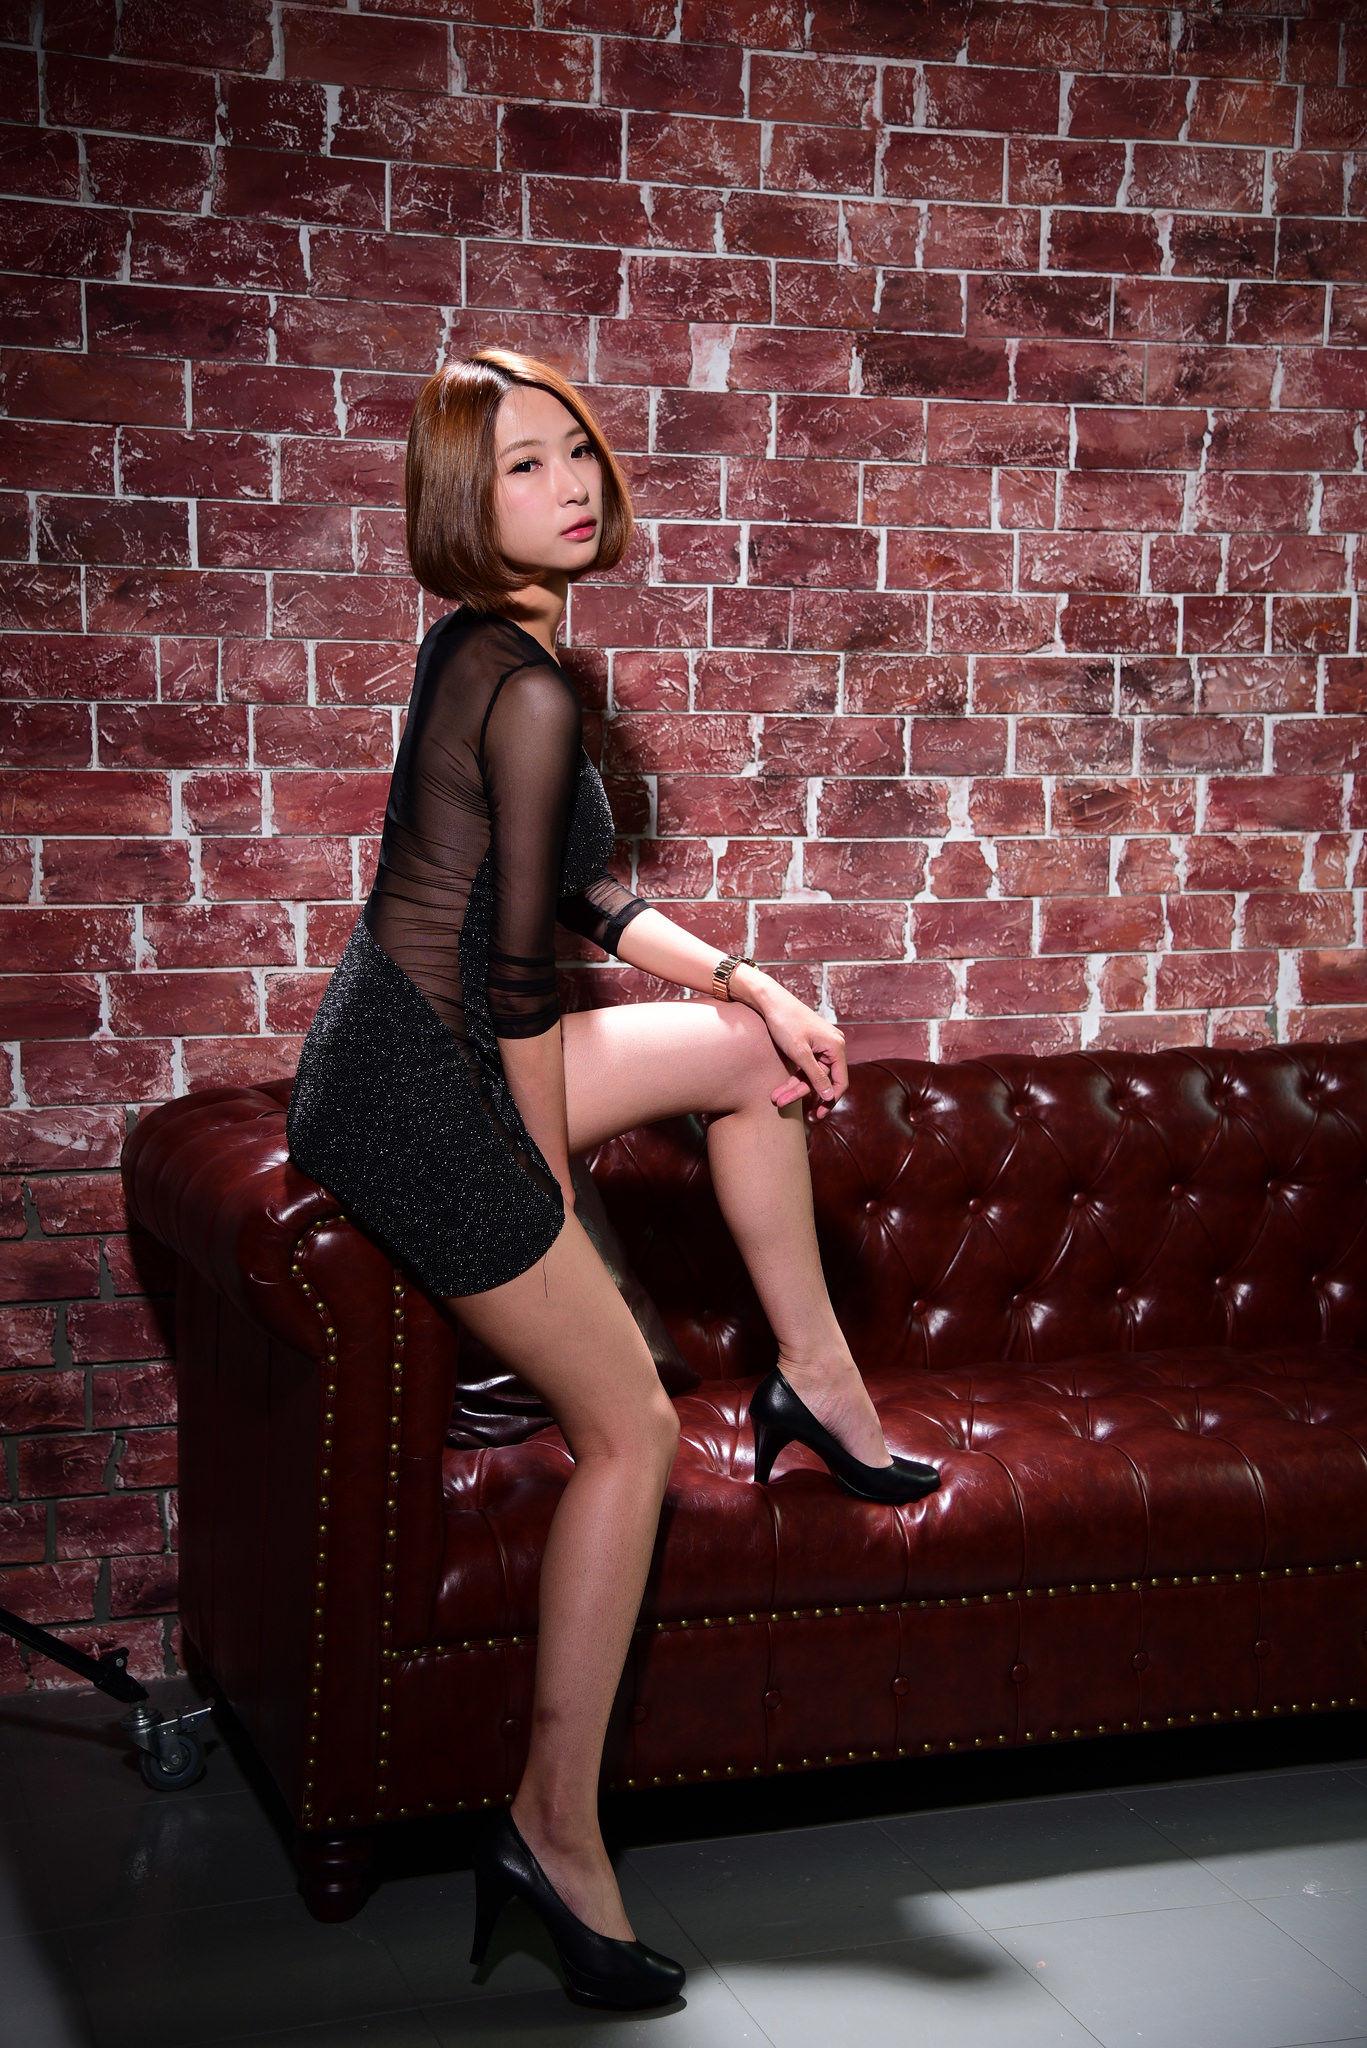 VOL.1515 [台湾正妹]短发魅惑美女:小芭蕉超高清个人性感漂亮大图(47P)